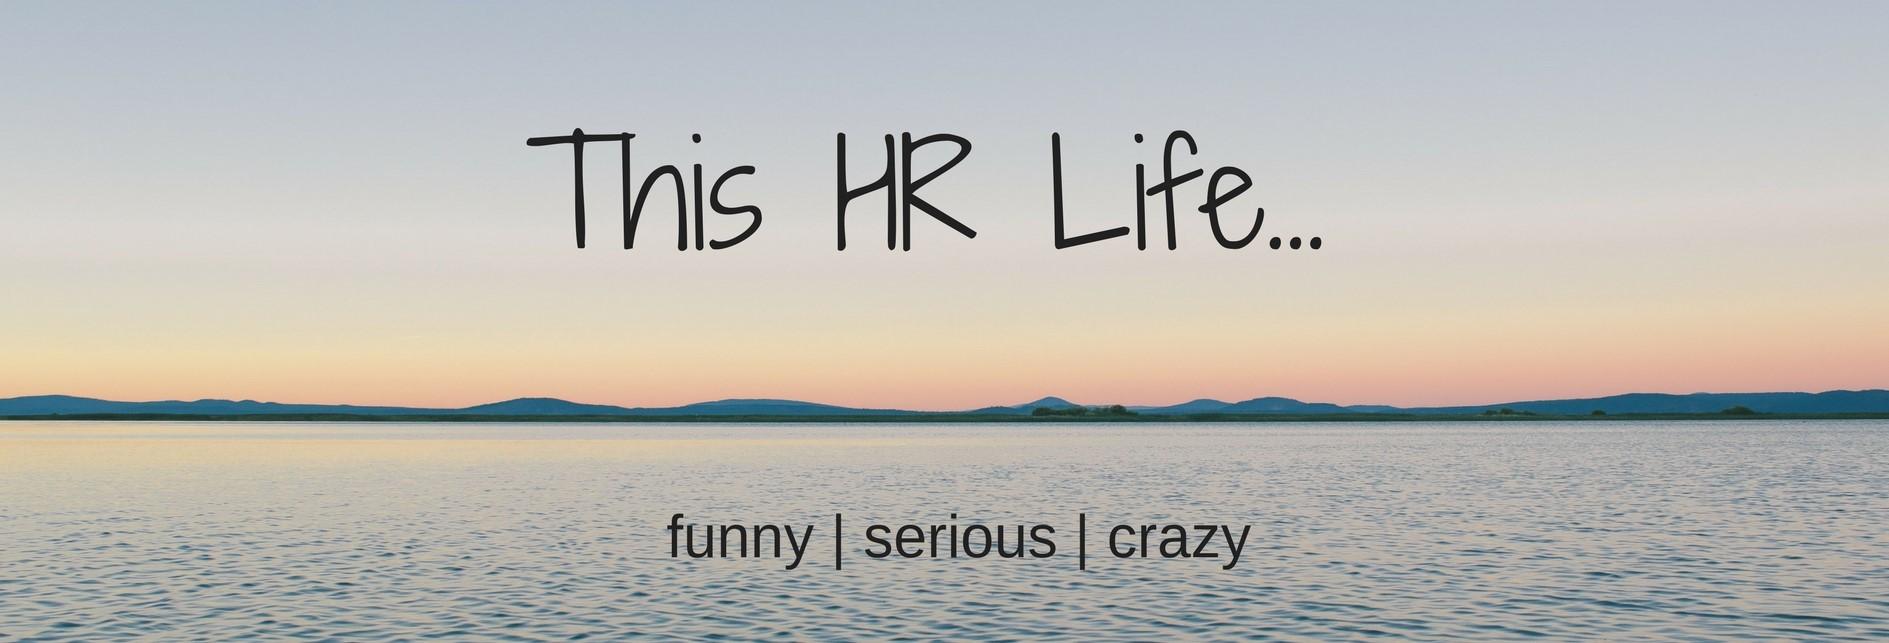 My HR Life...HR What???